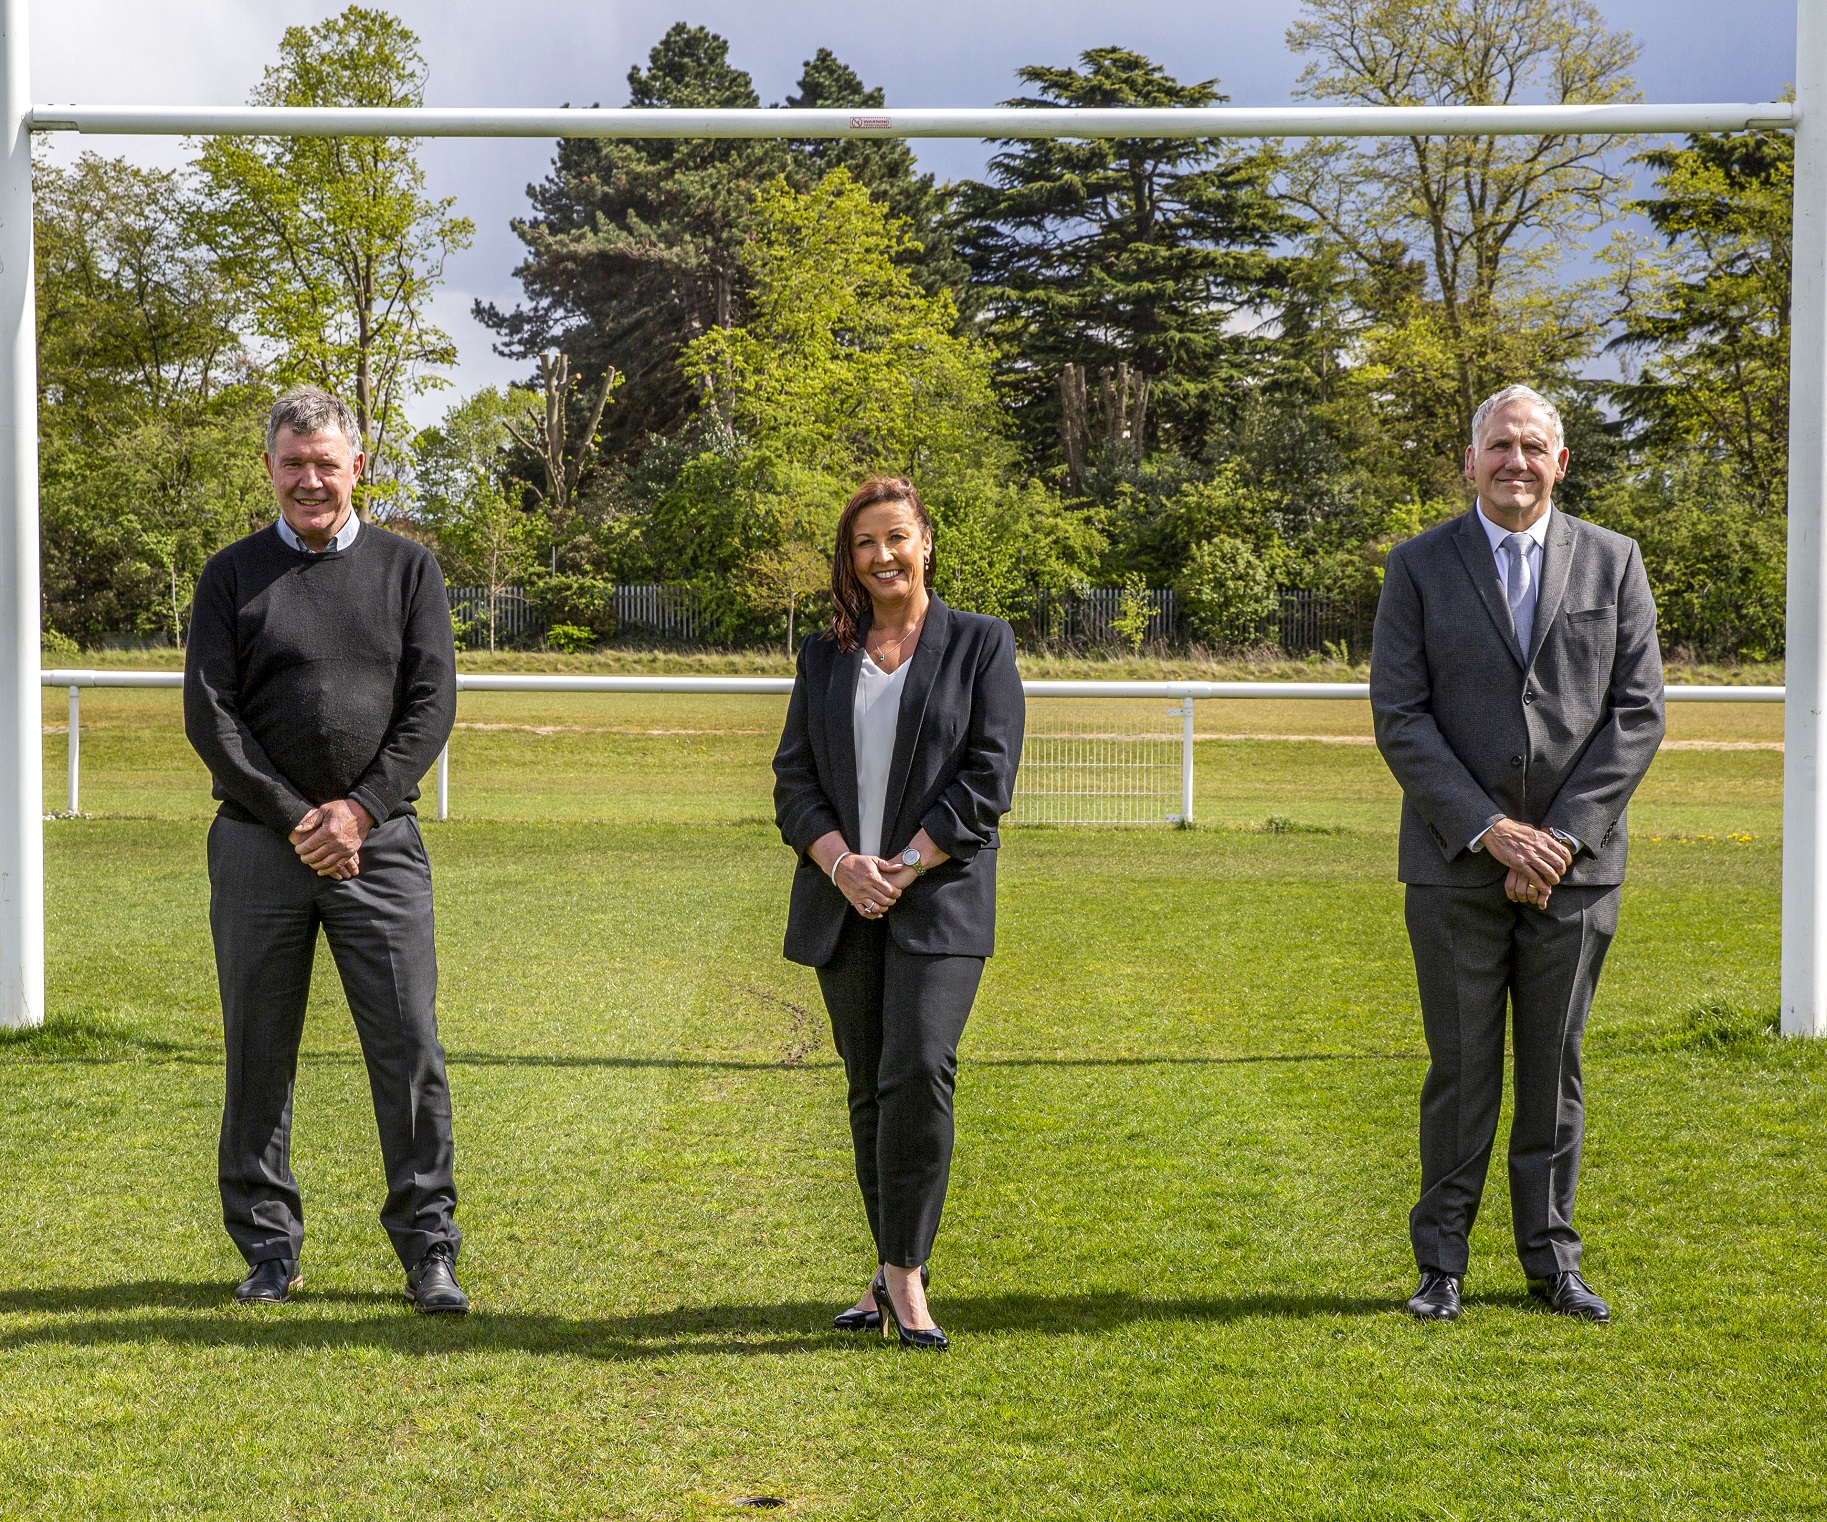 London Irish launch professional women's team